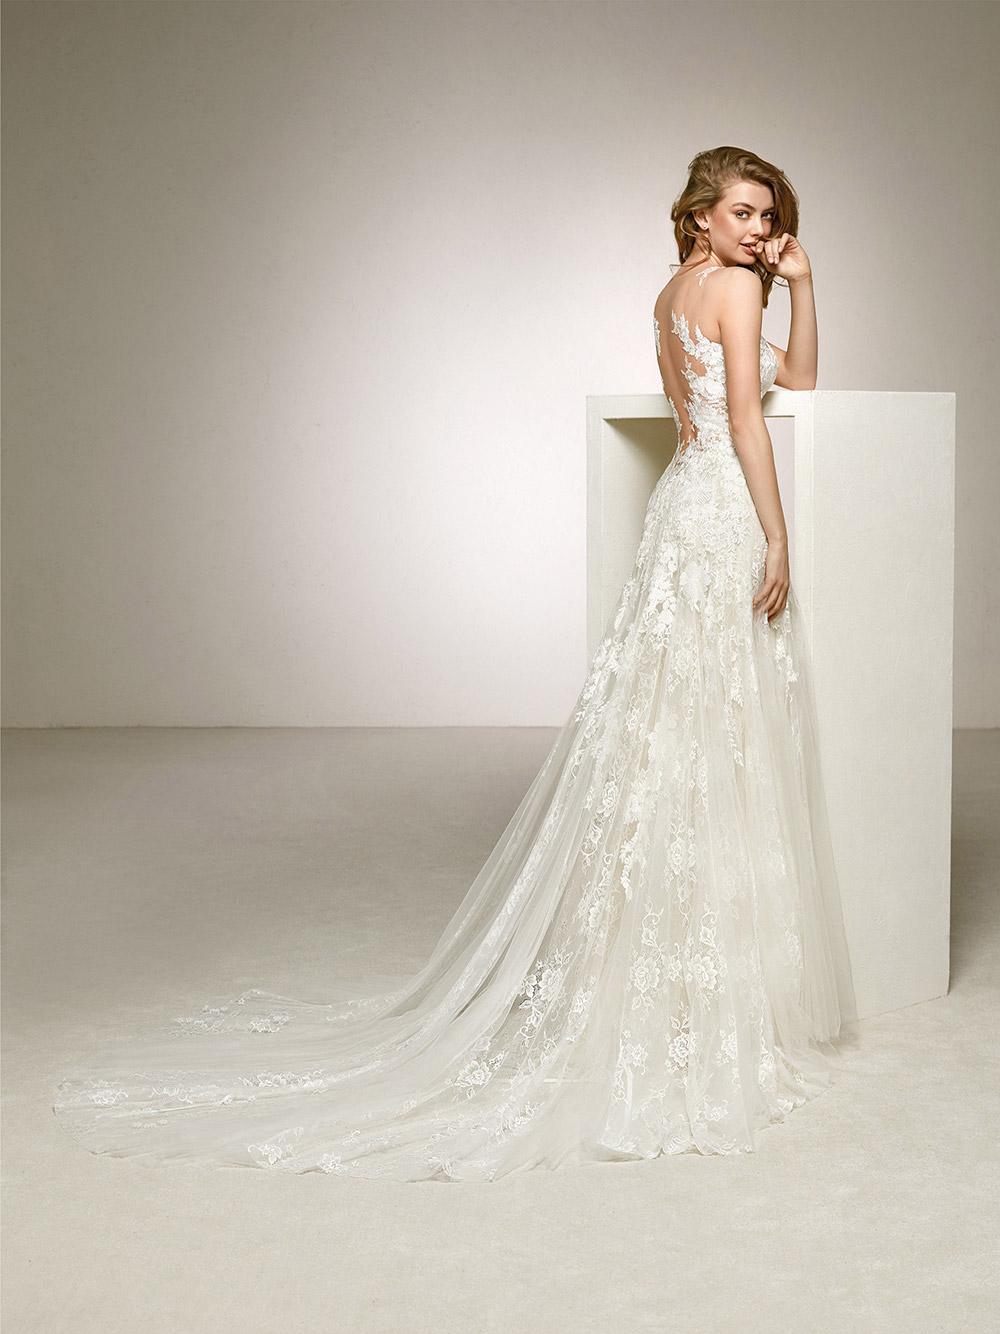 Dalia - Pronovias 2018 Bridal Collection. www.theweddingnotebook.com